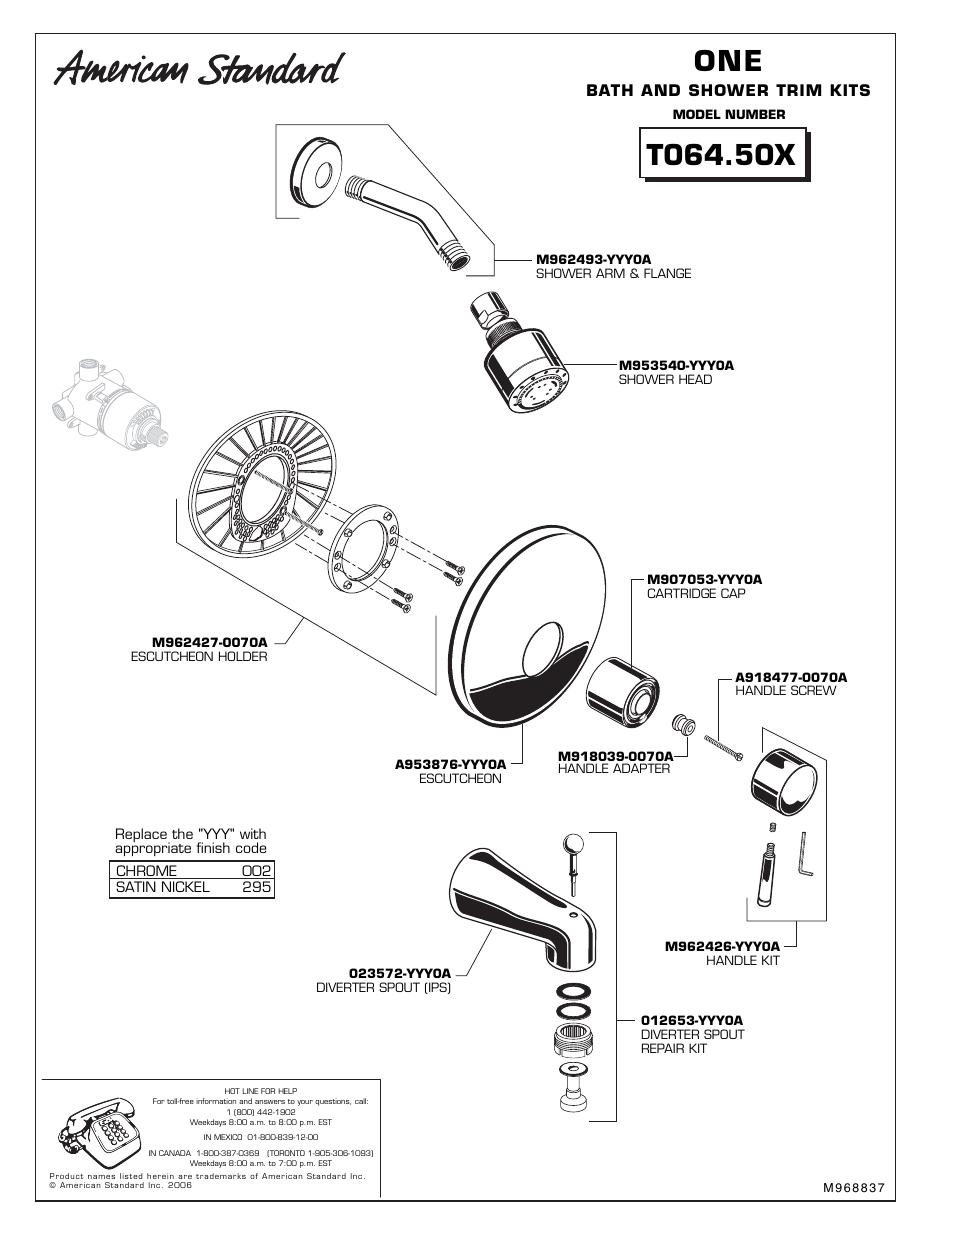 American Standard M962427-0070A Escutcheon Holder